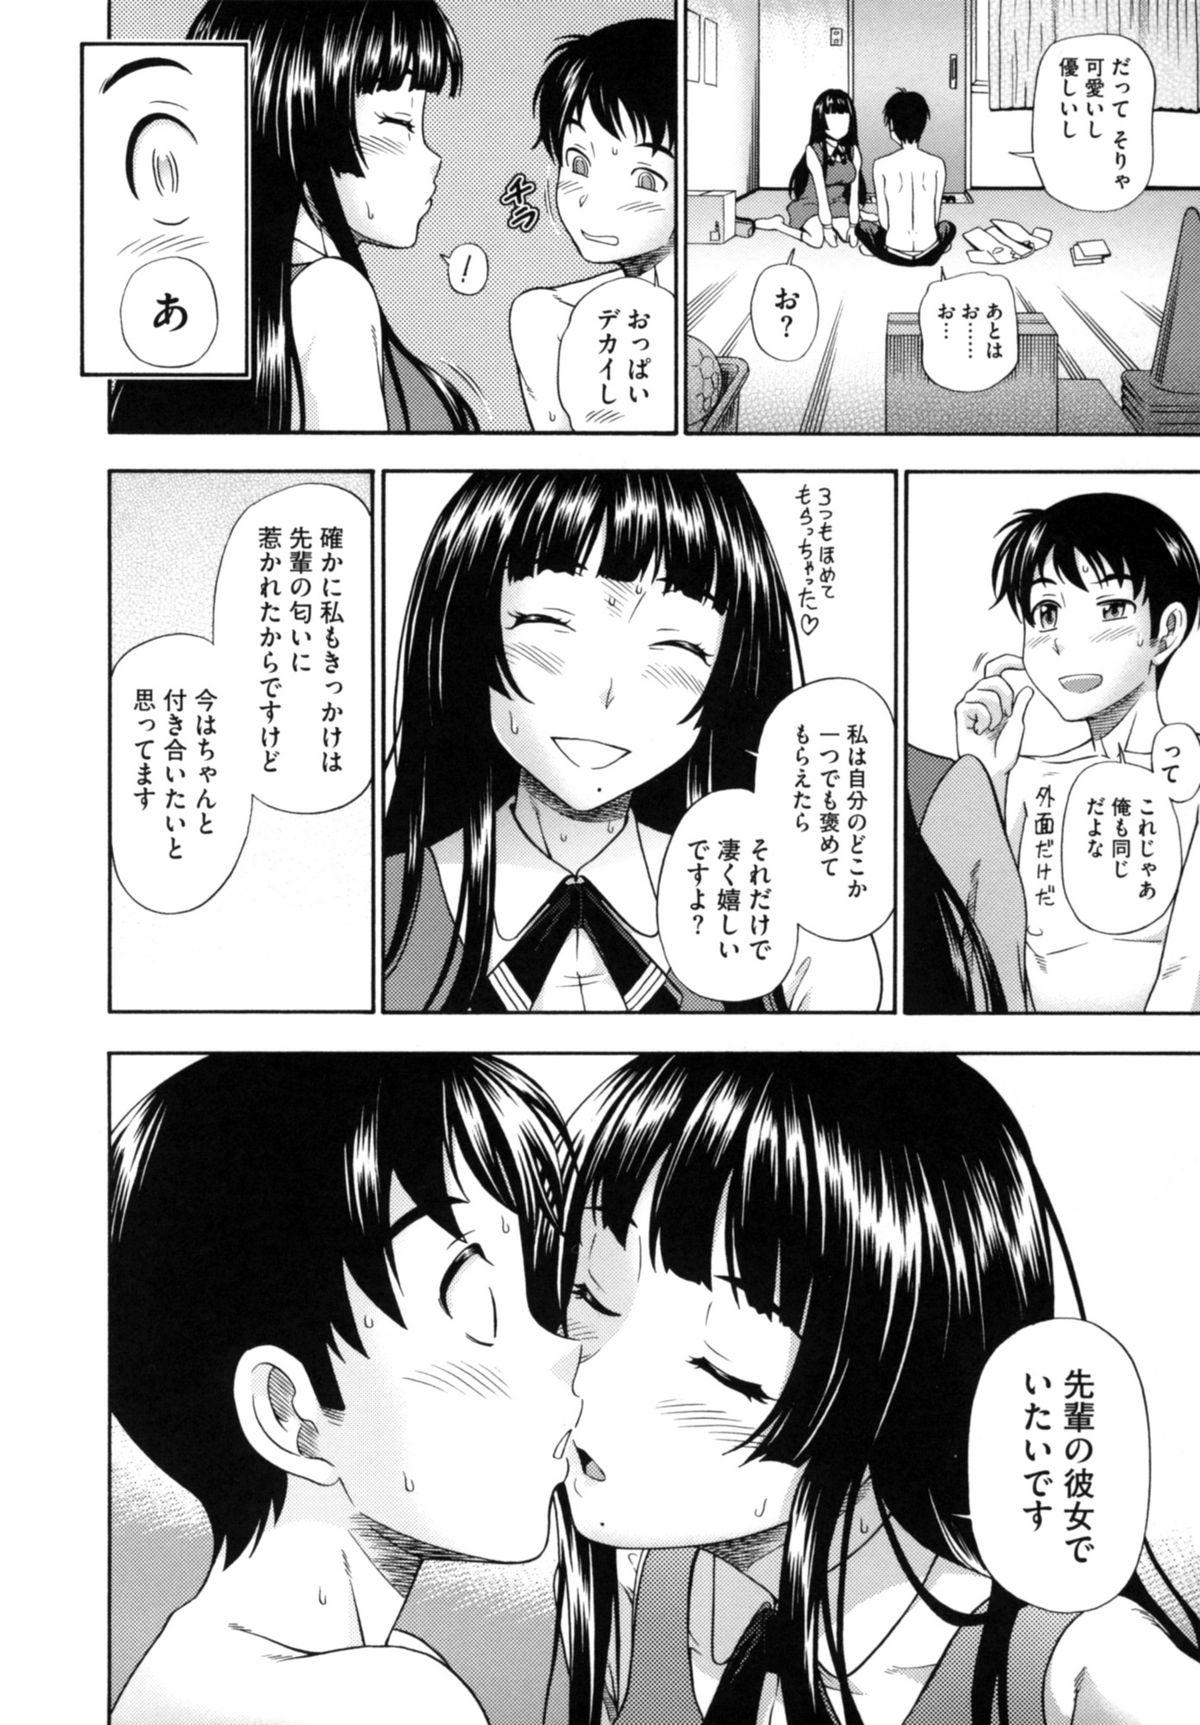 Soushisouai Note Nisatsume 51